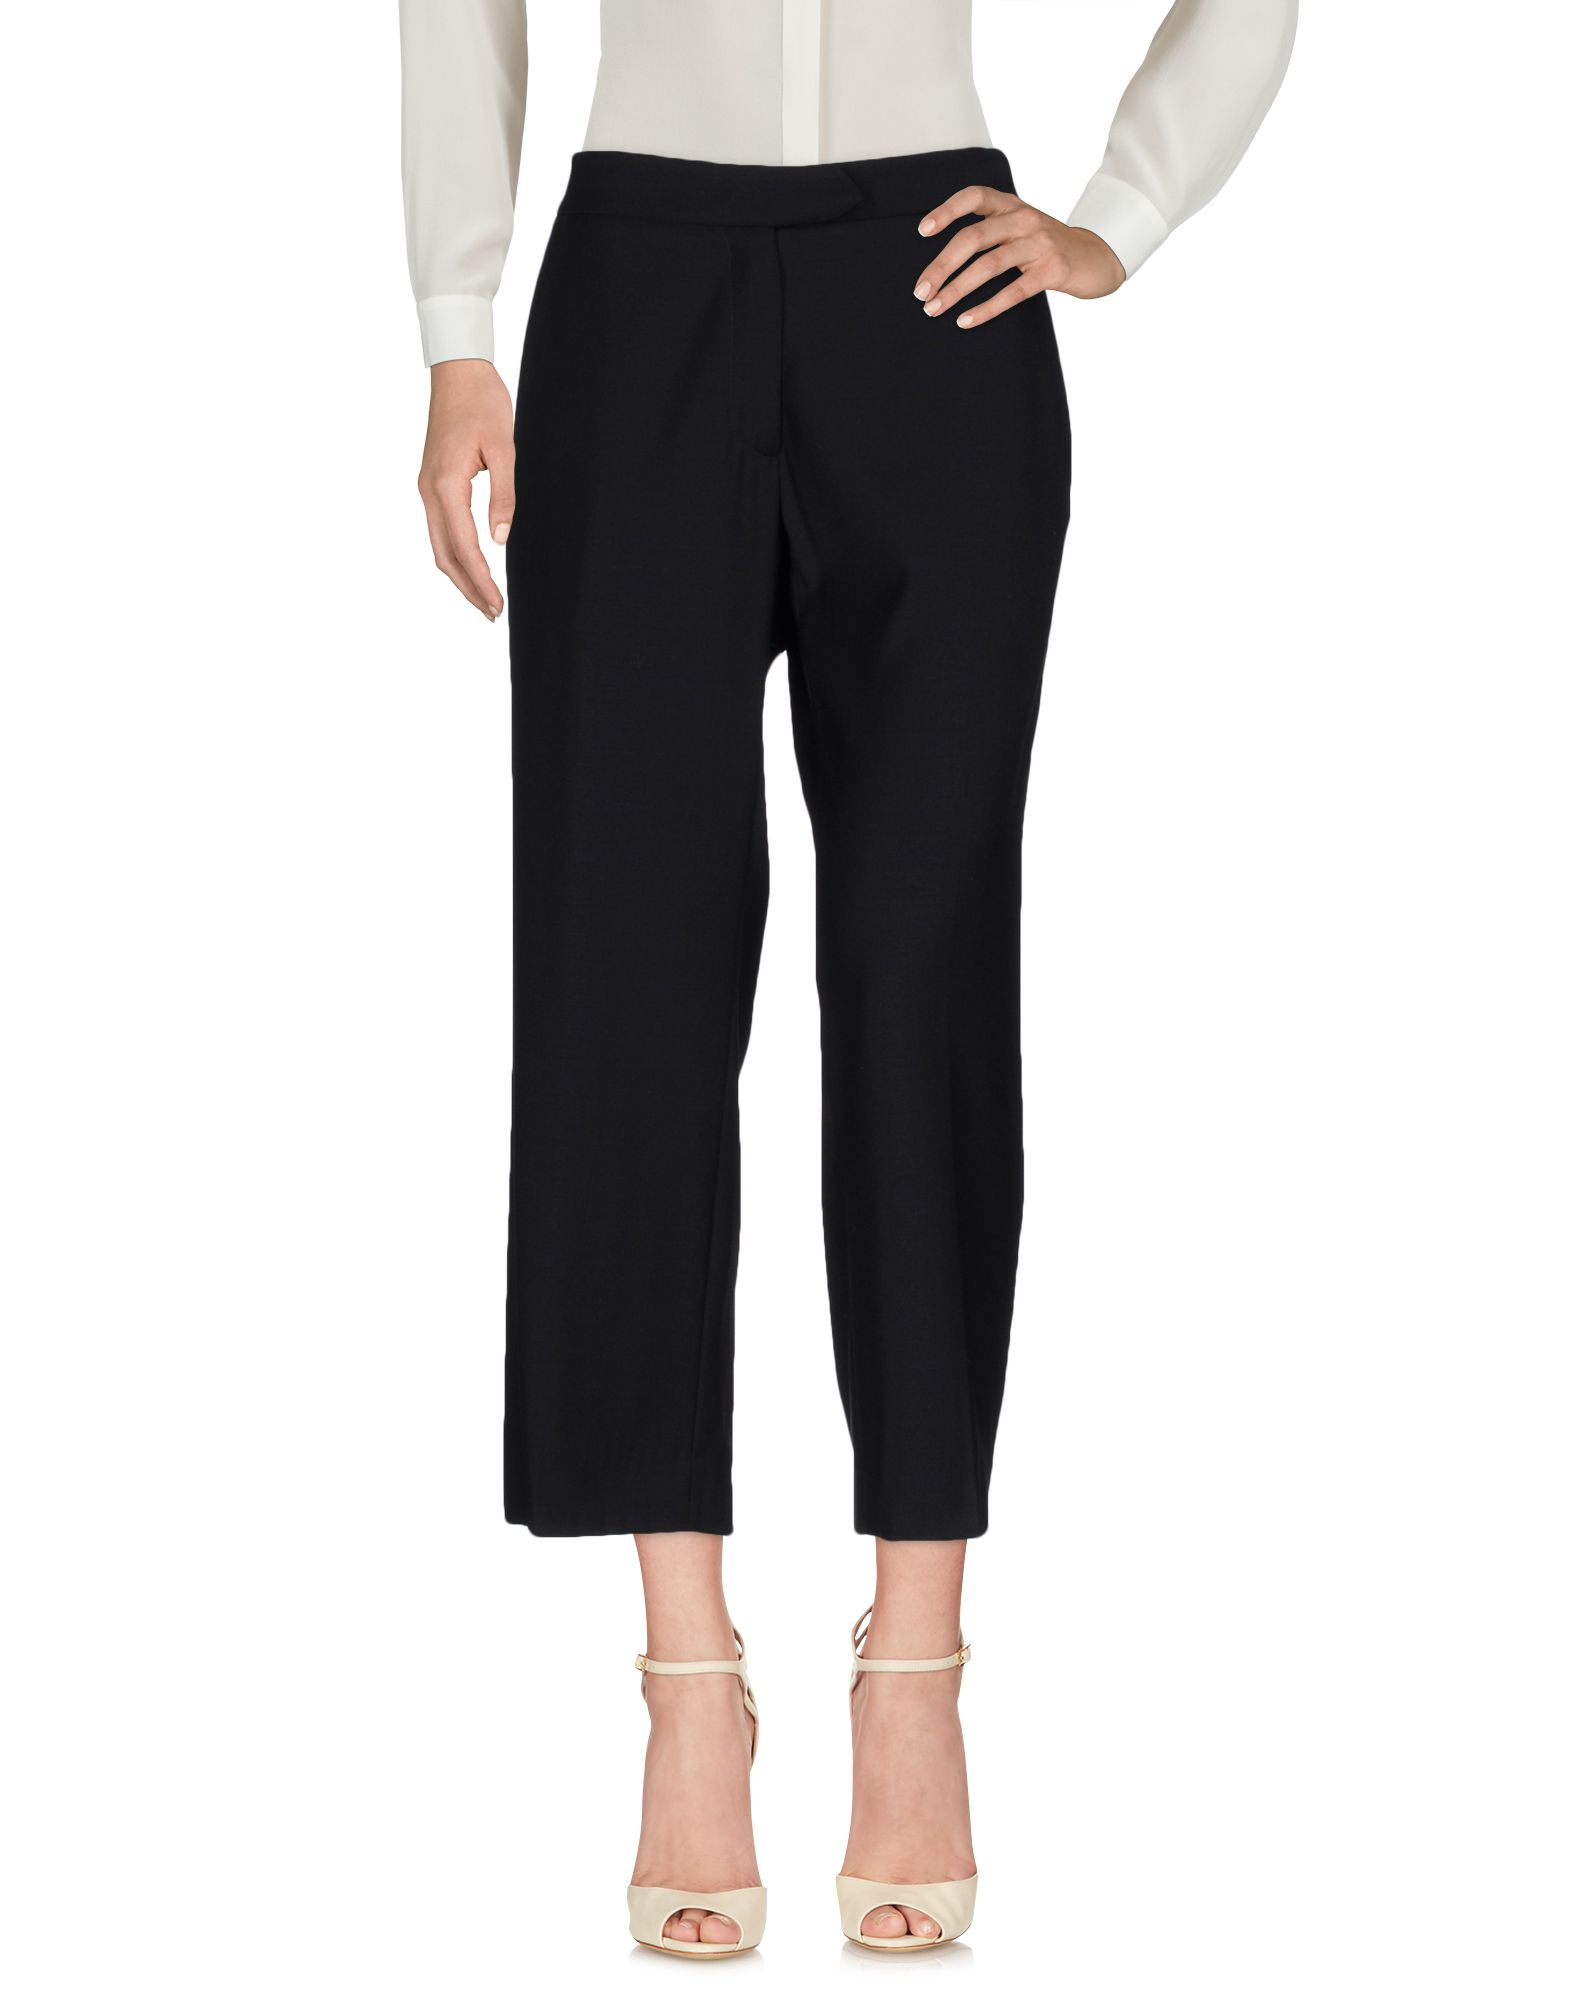 PREEN by THORNTON BREGAZZI Damen Hose Farbe Schwarz Größe 4